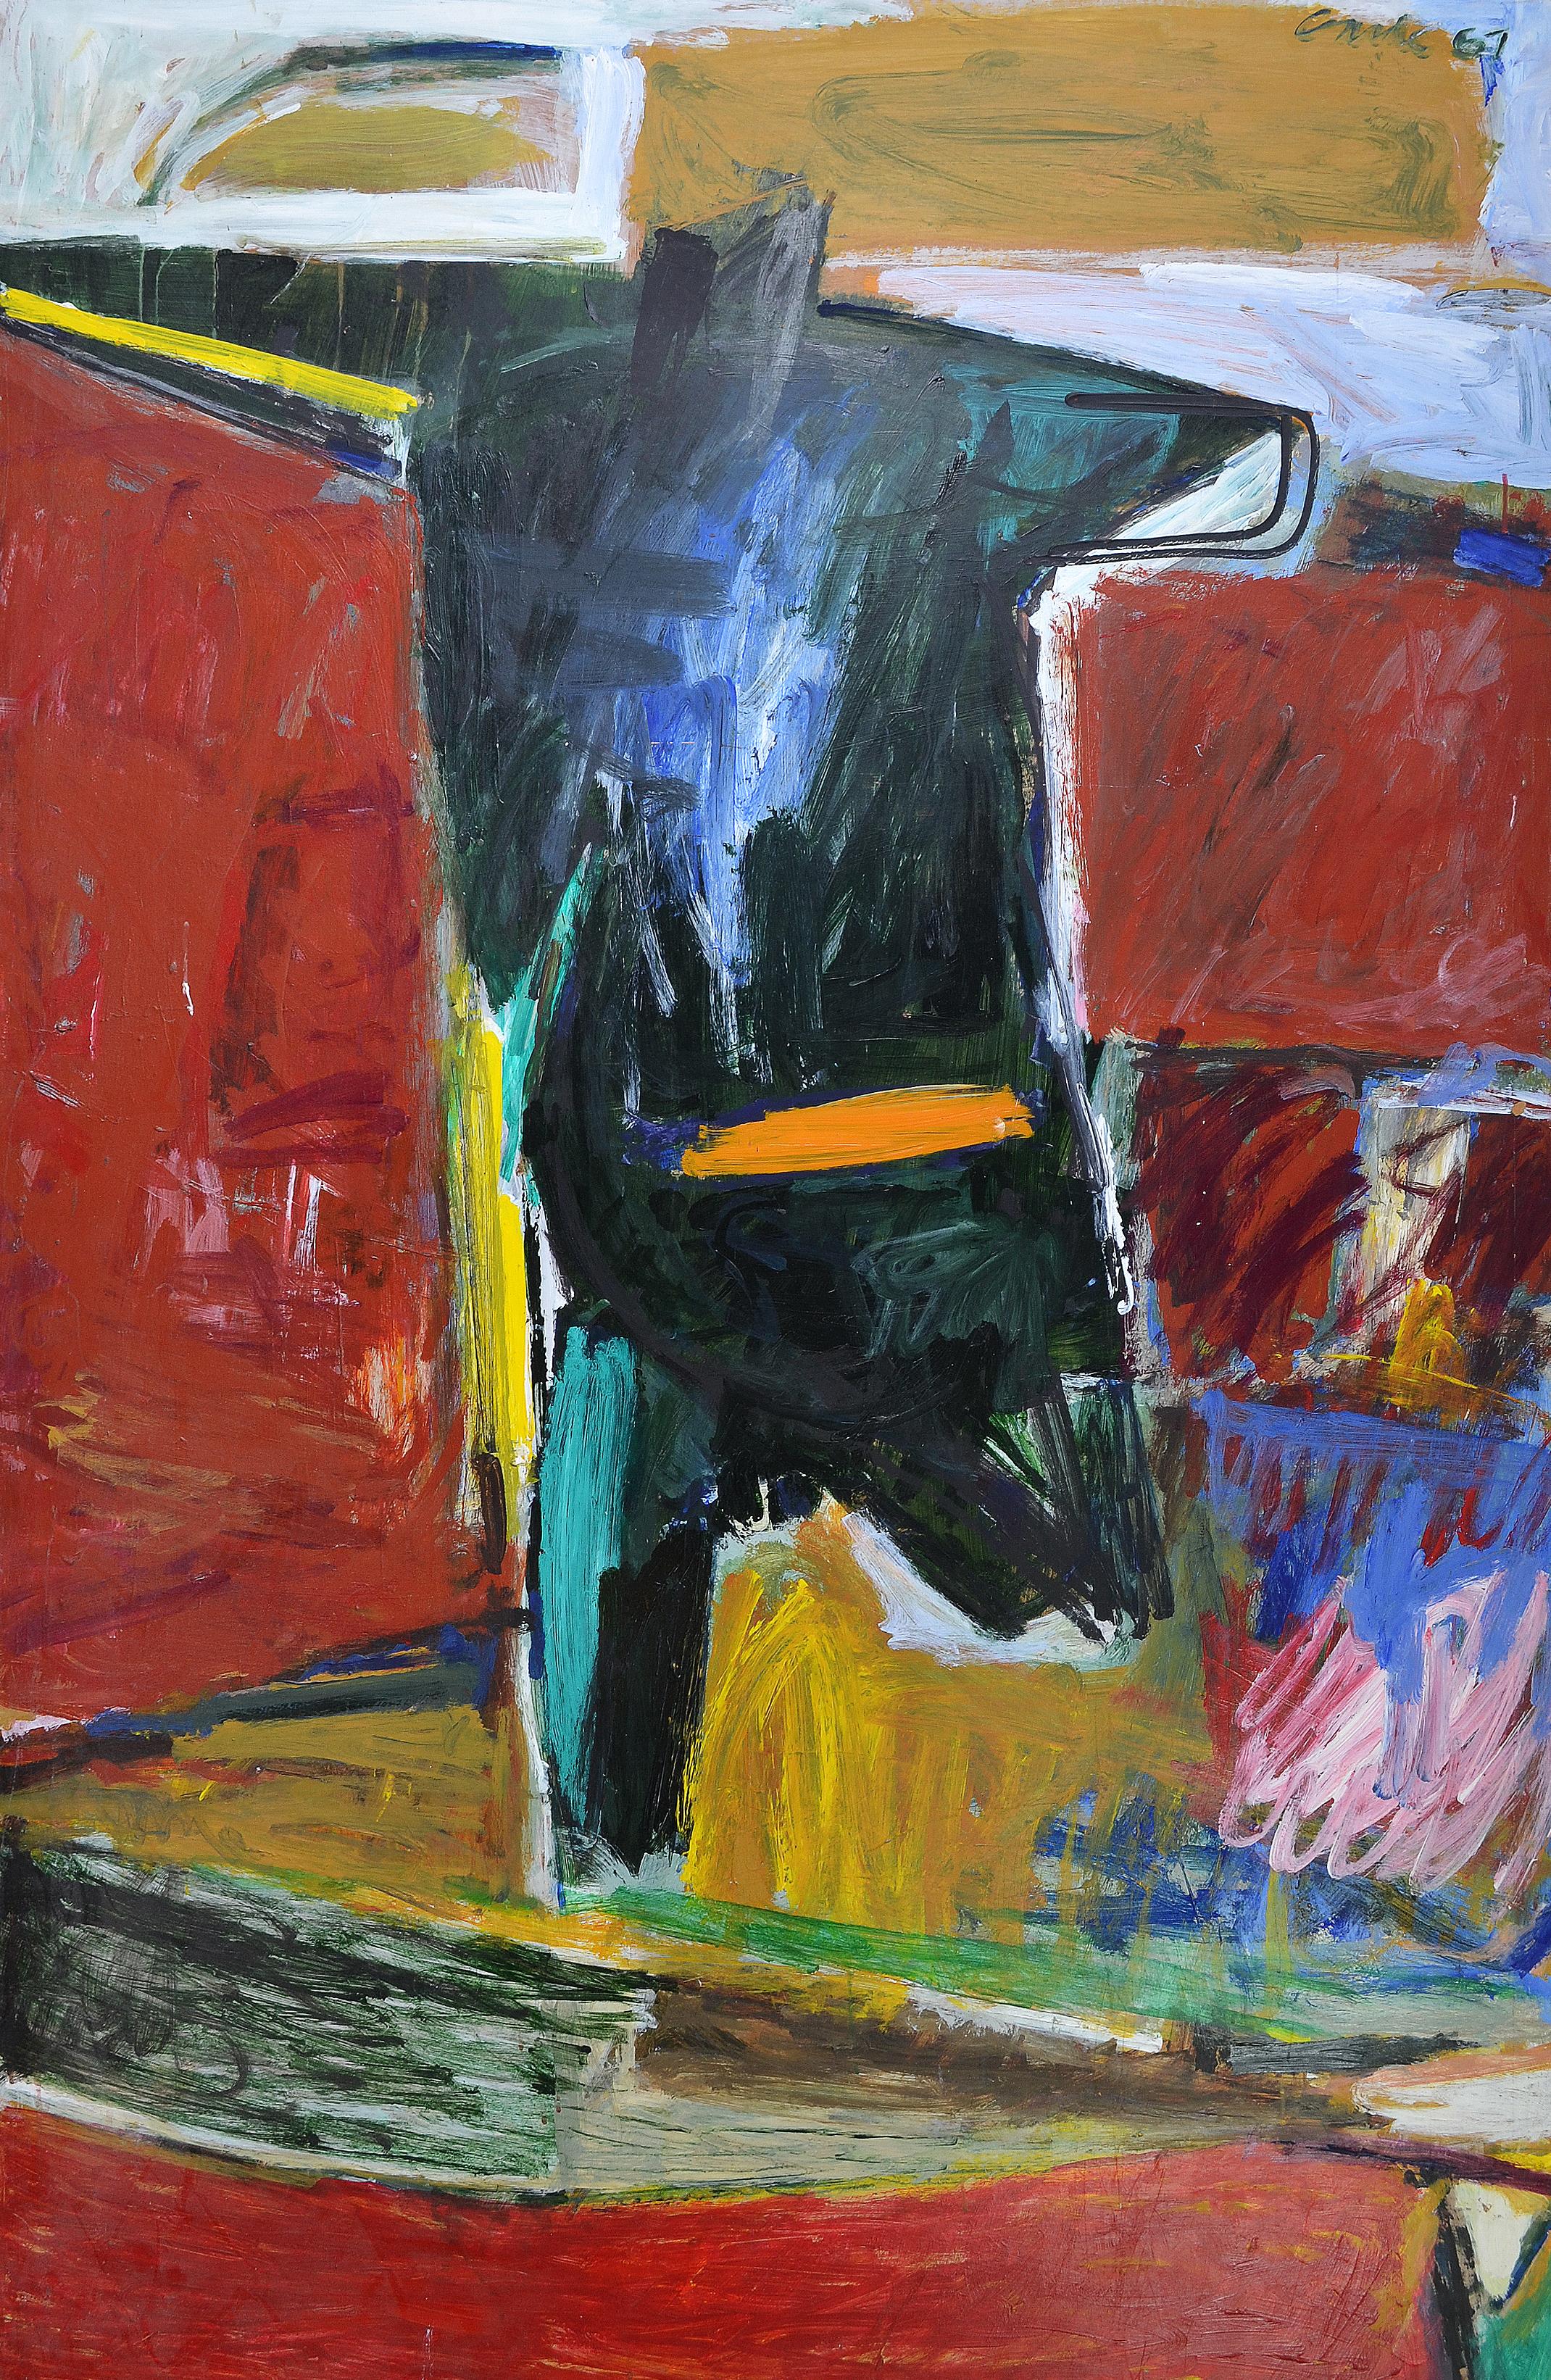 Lurch , 1967 Oil on hardboard (masonite) 72 x 48 in. (183 x 122 cm.) Photography courtesy of Joshua DeMello